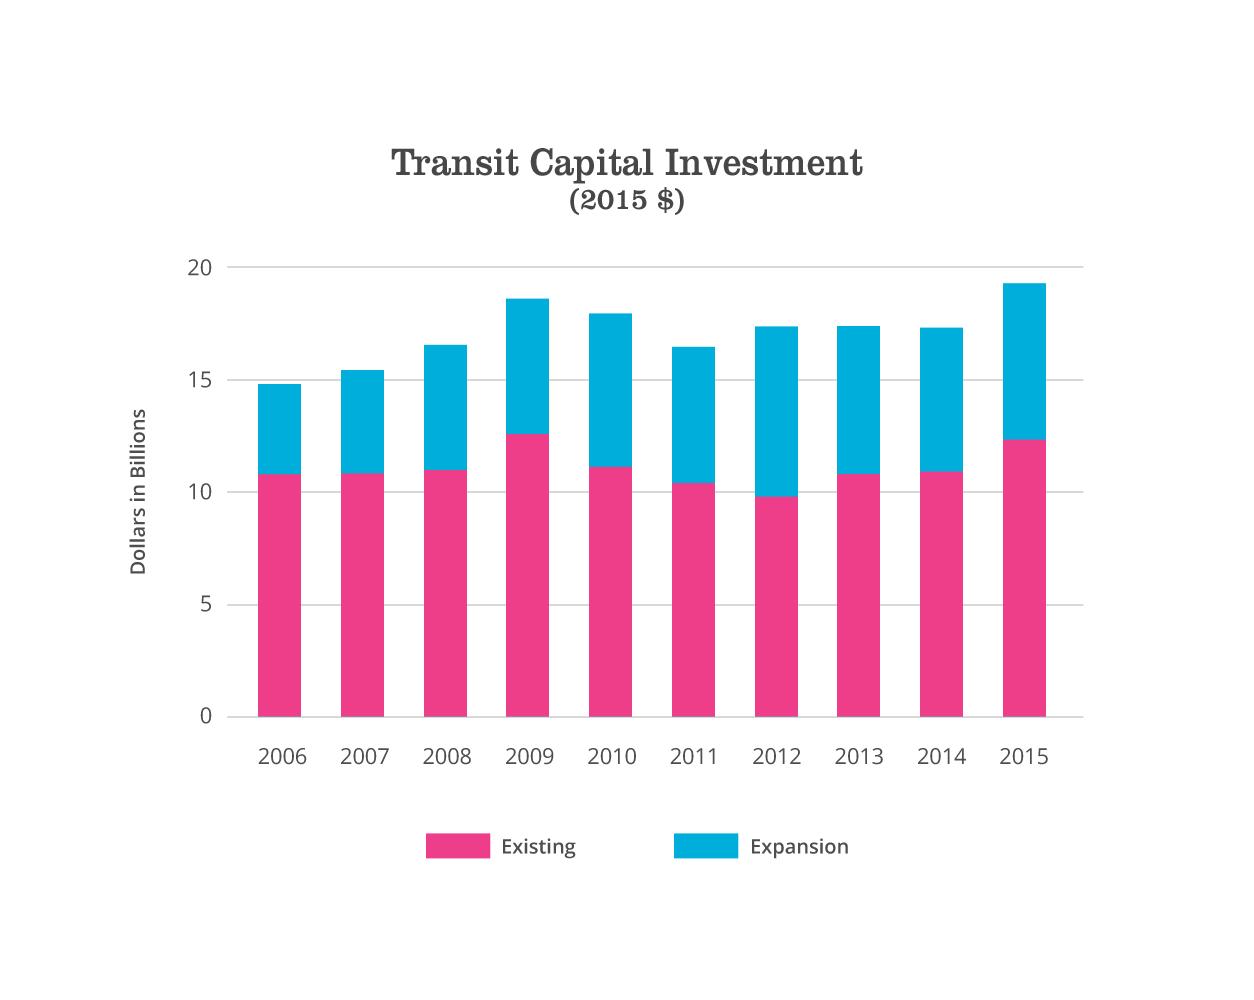 transit capital investment graph